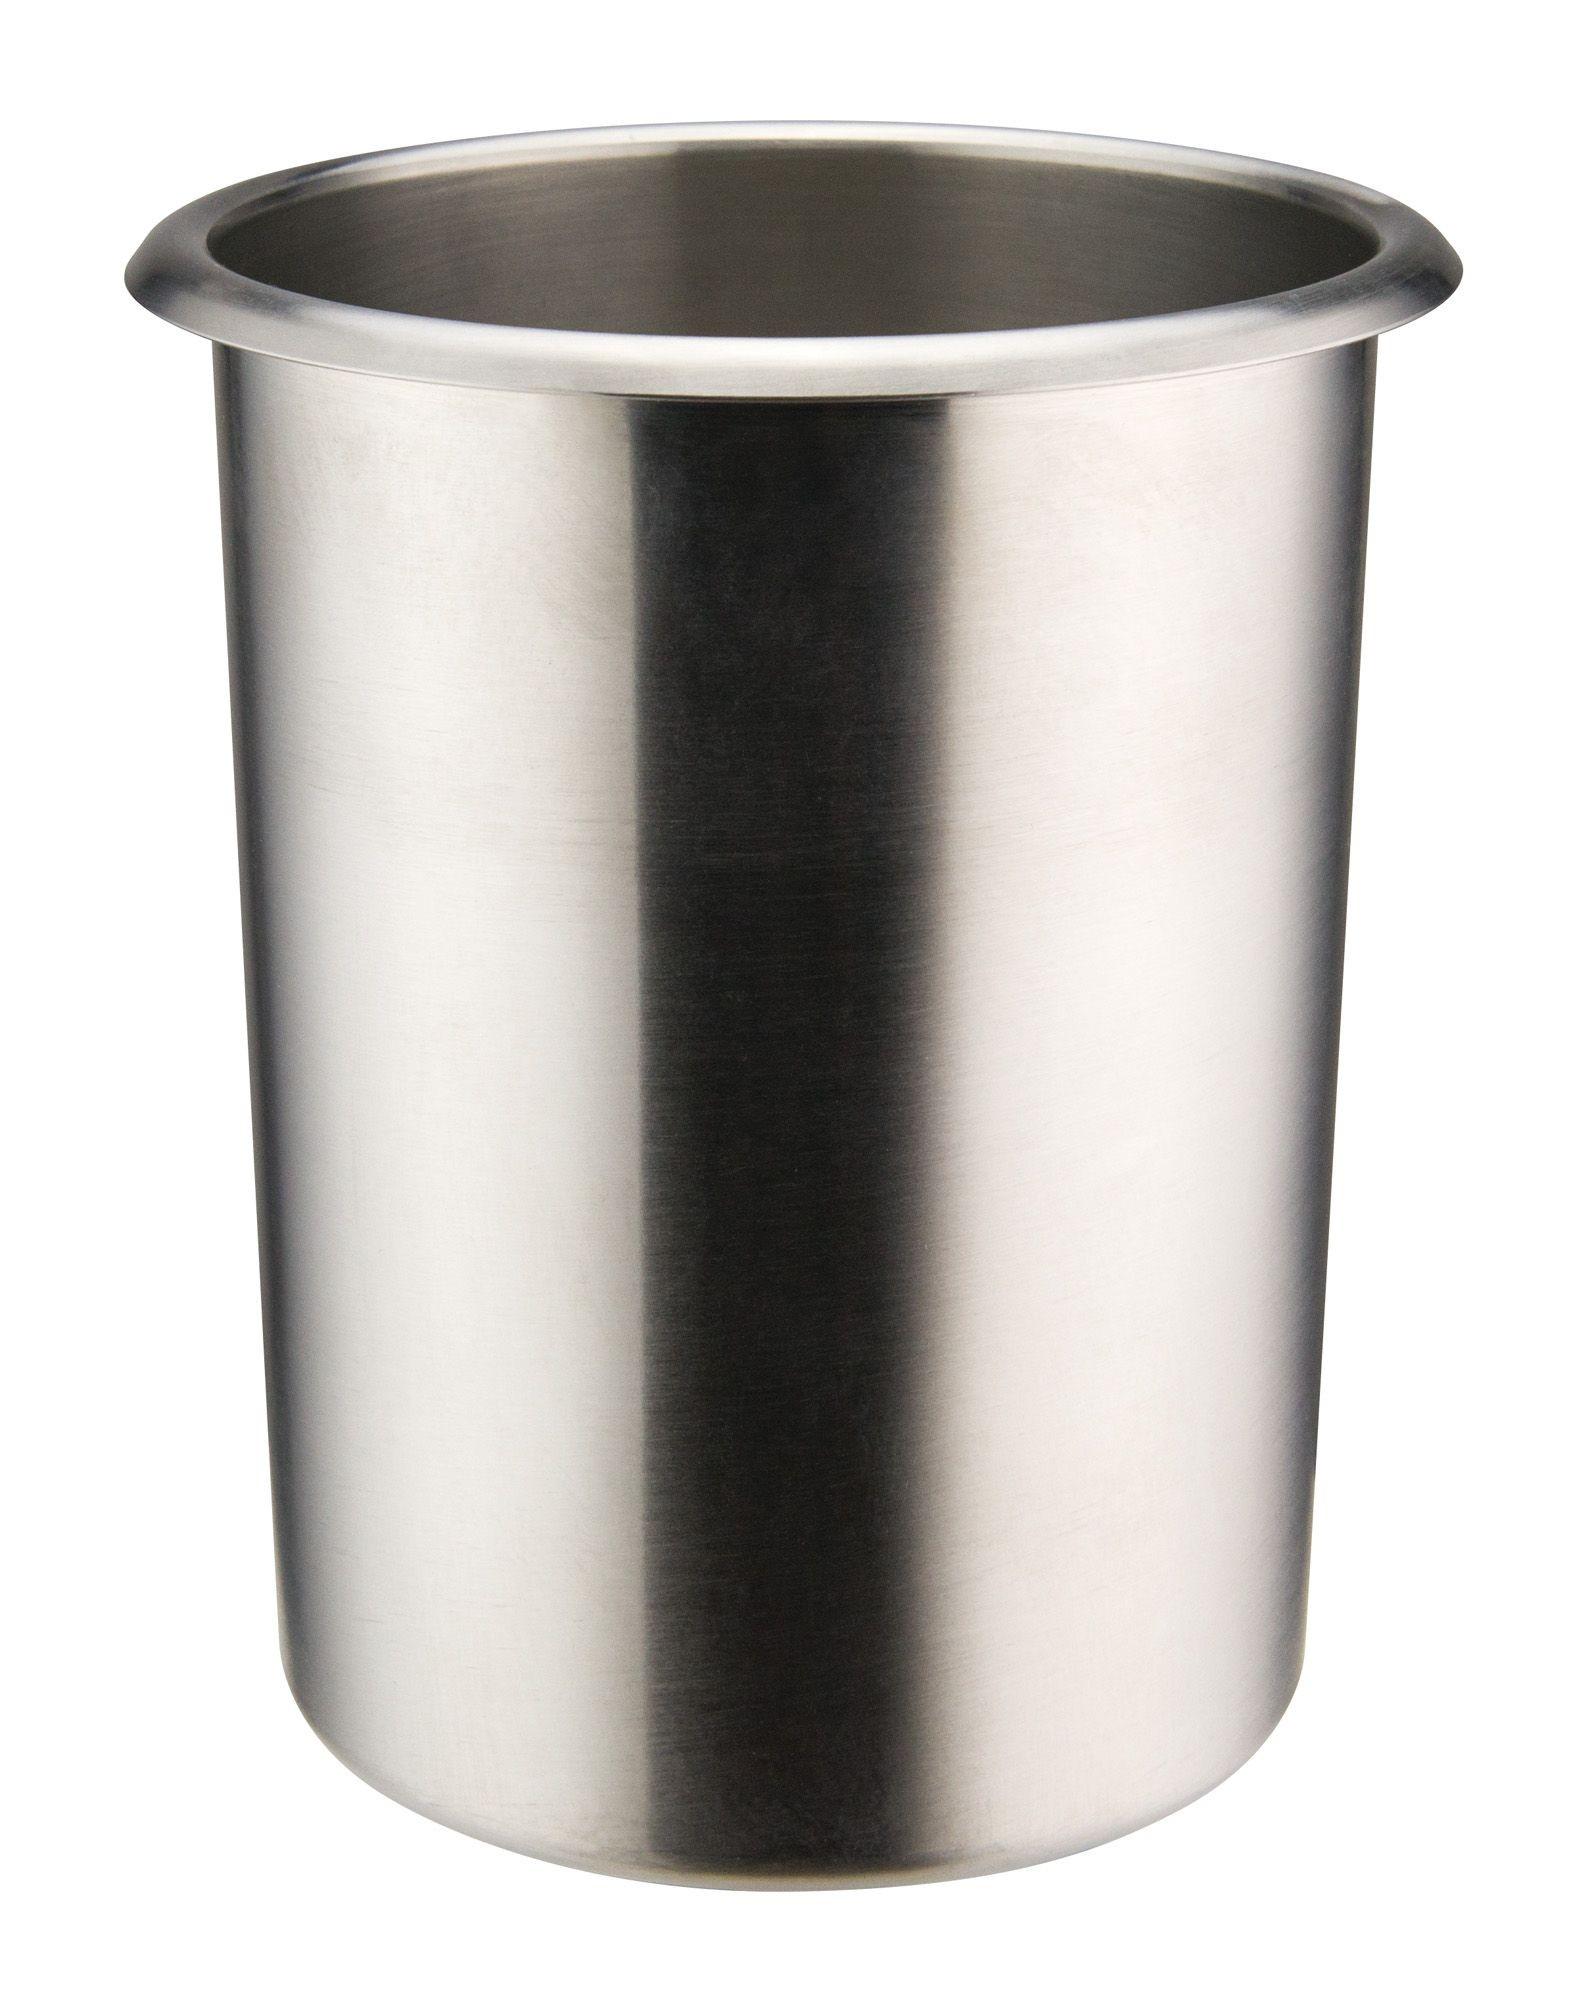 Winco BAMN-2 Stainless Steel Bain Marie Pot 2 Qt.